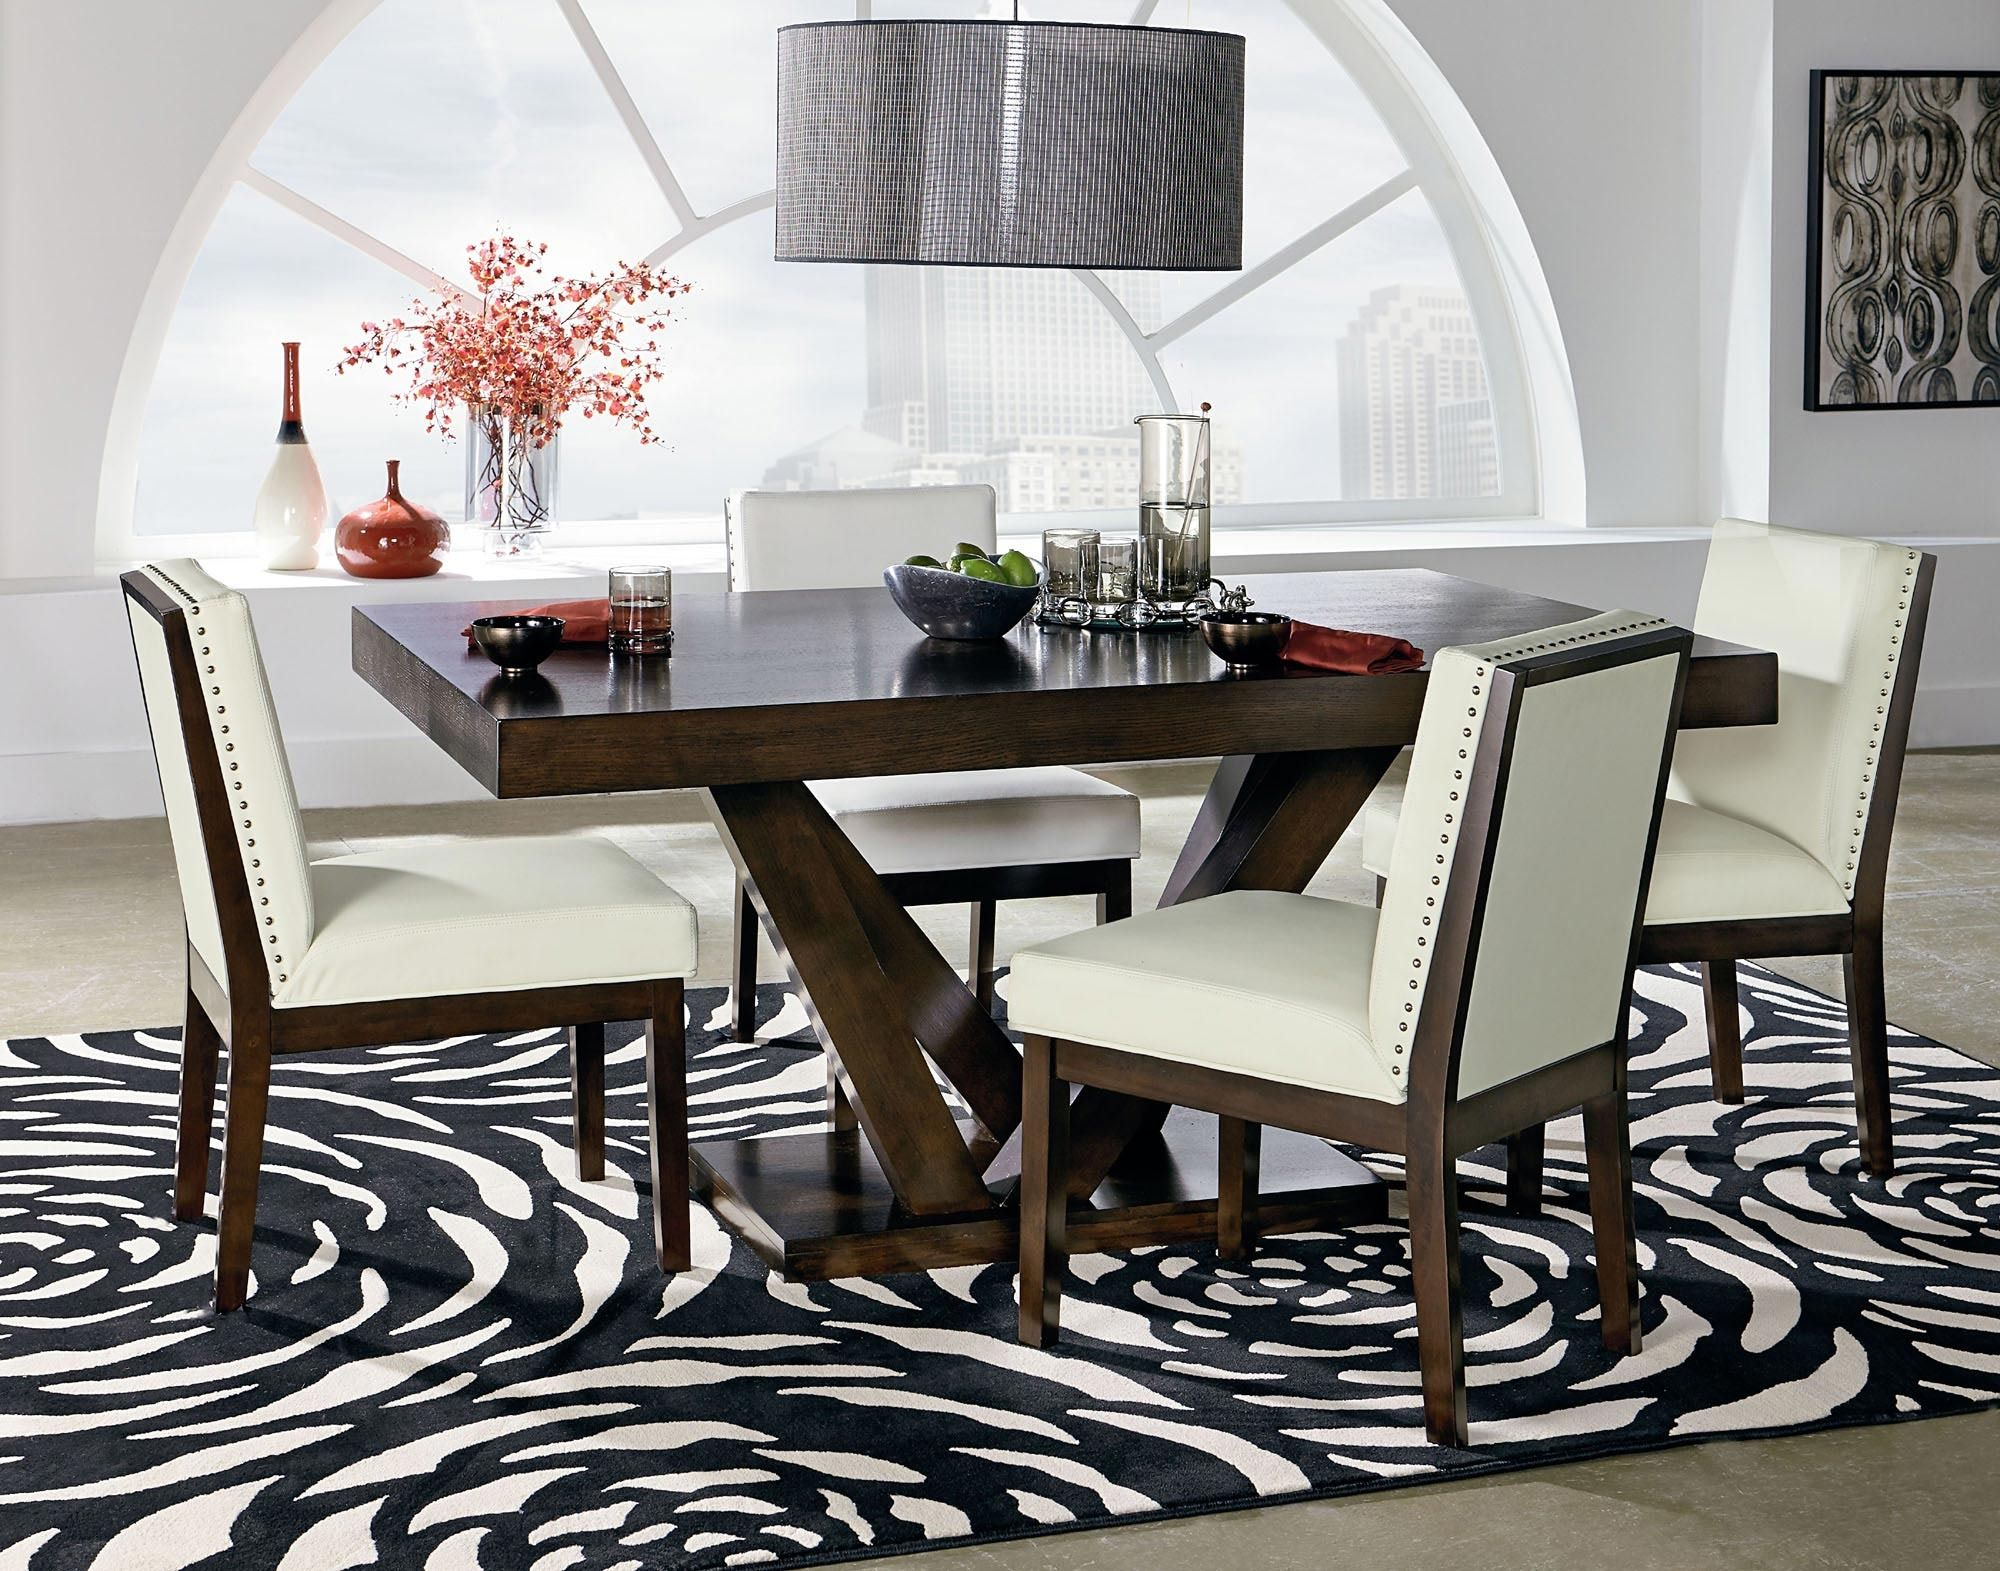 Couture Elegance Dining Pedestal Table | Standard Furniture | Home ...